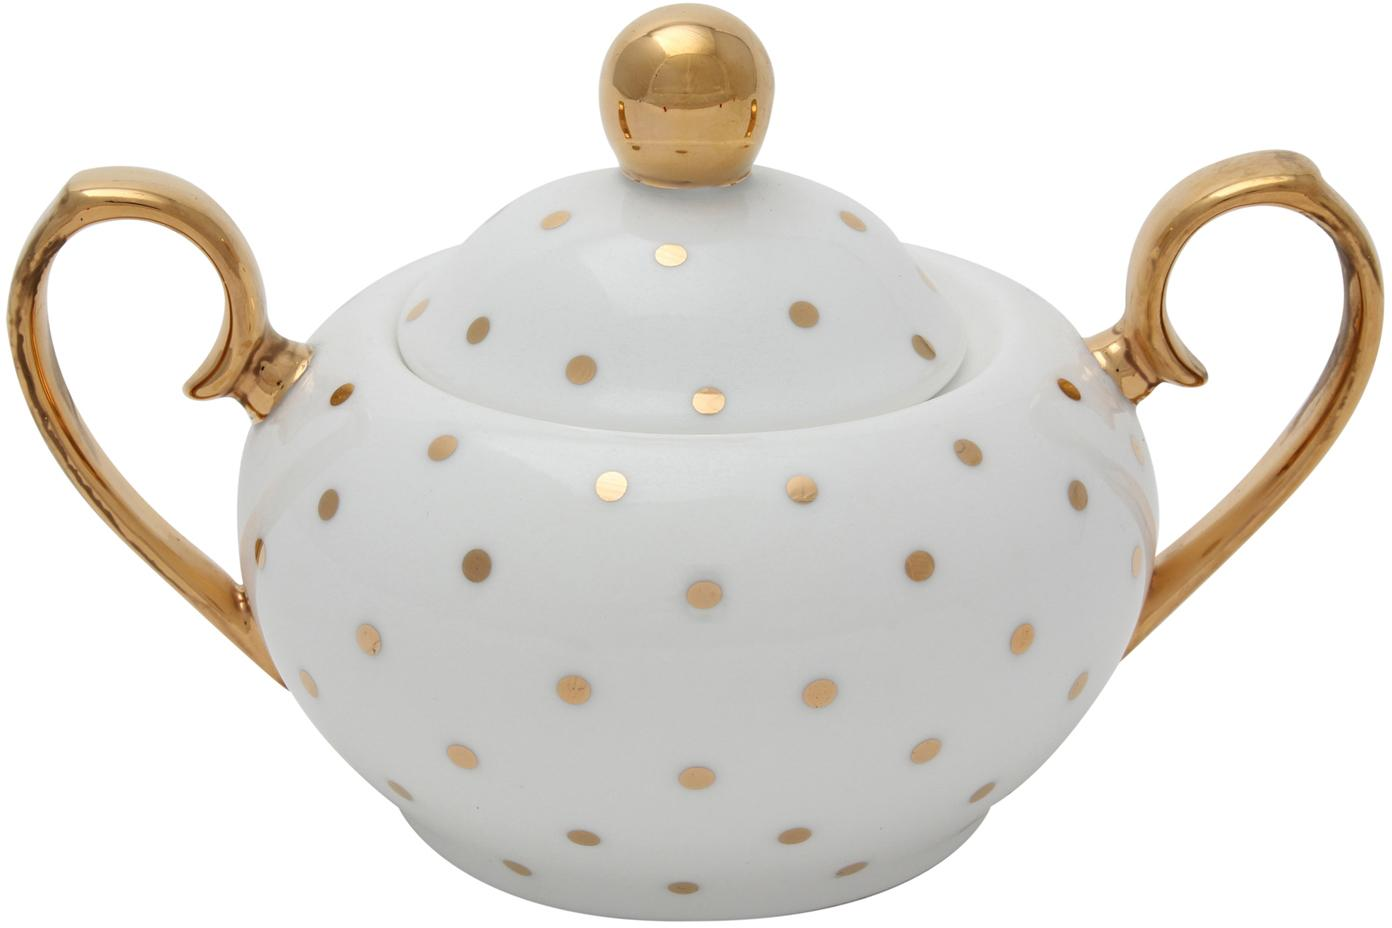 Suikerpot Miss Golightly, Beenderporselein, verguld, Wit, goud, Ø 9 x H 8 cm